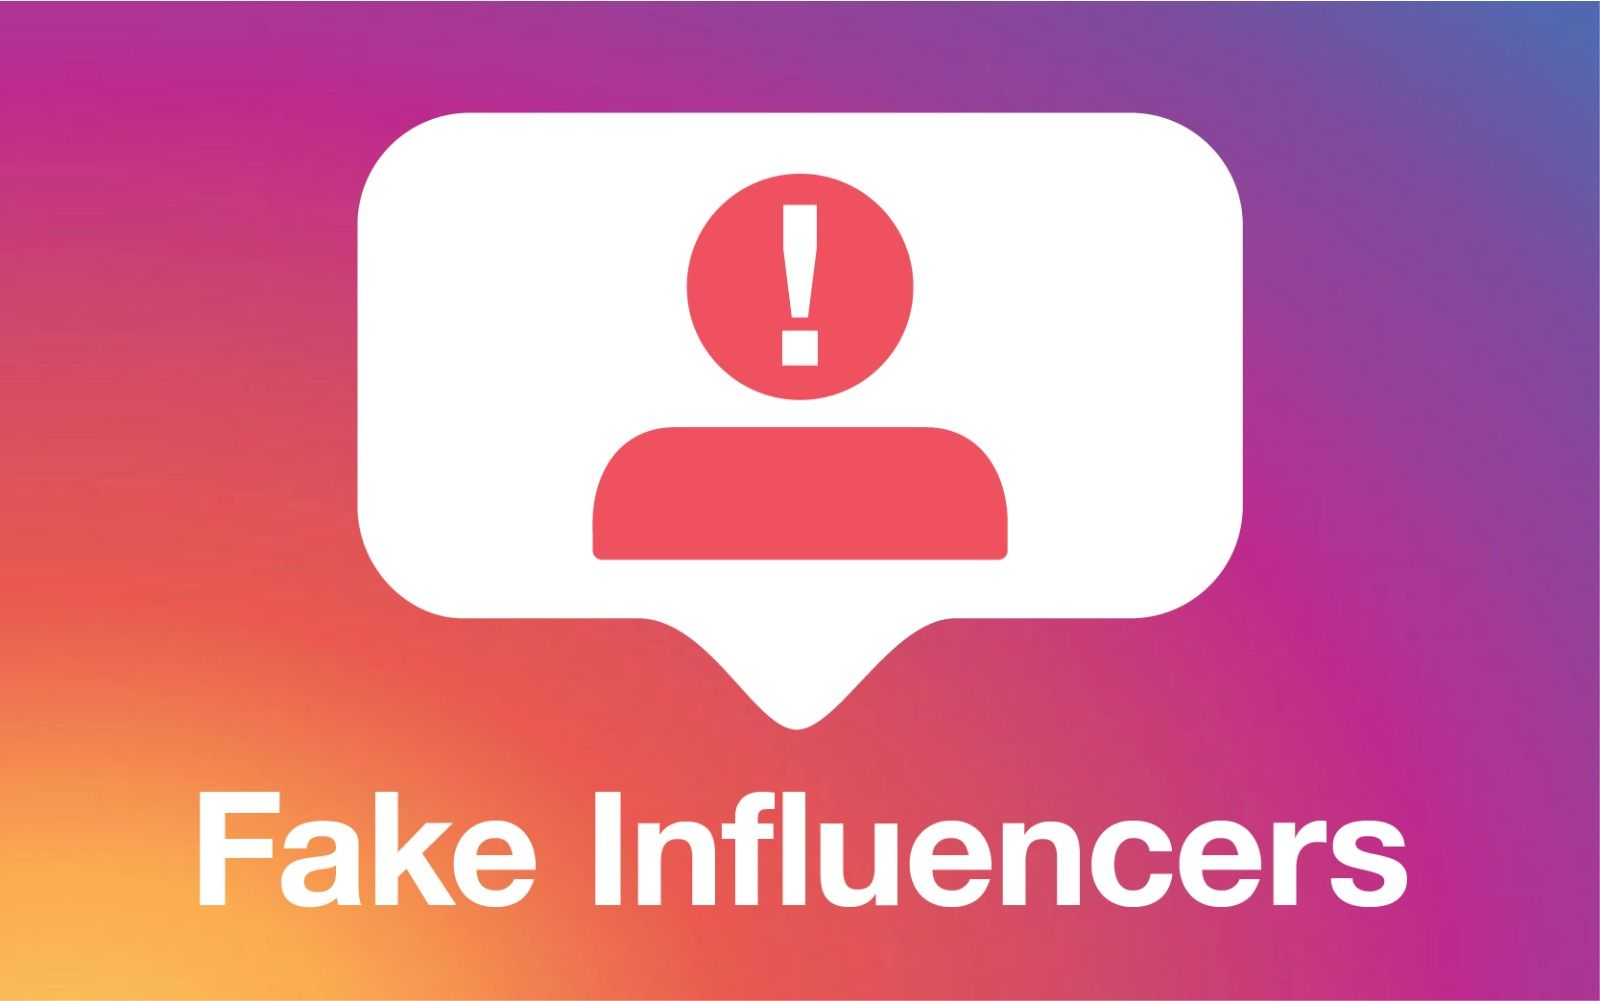 Influencers en el punto de mira